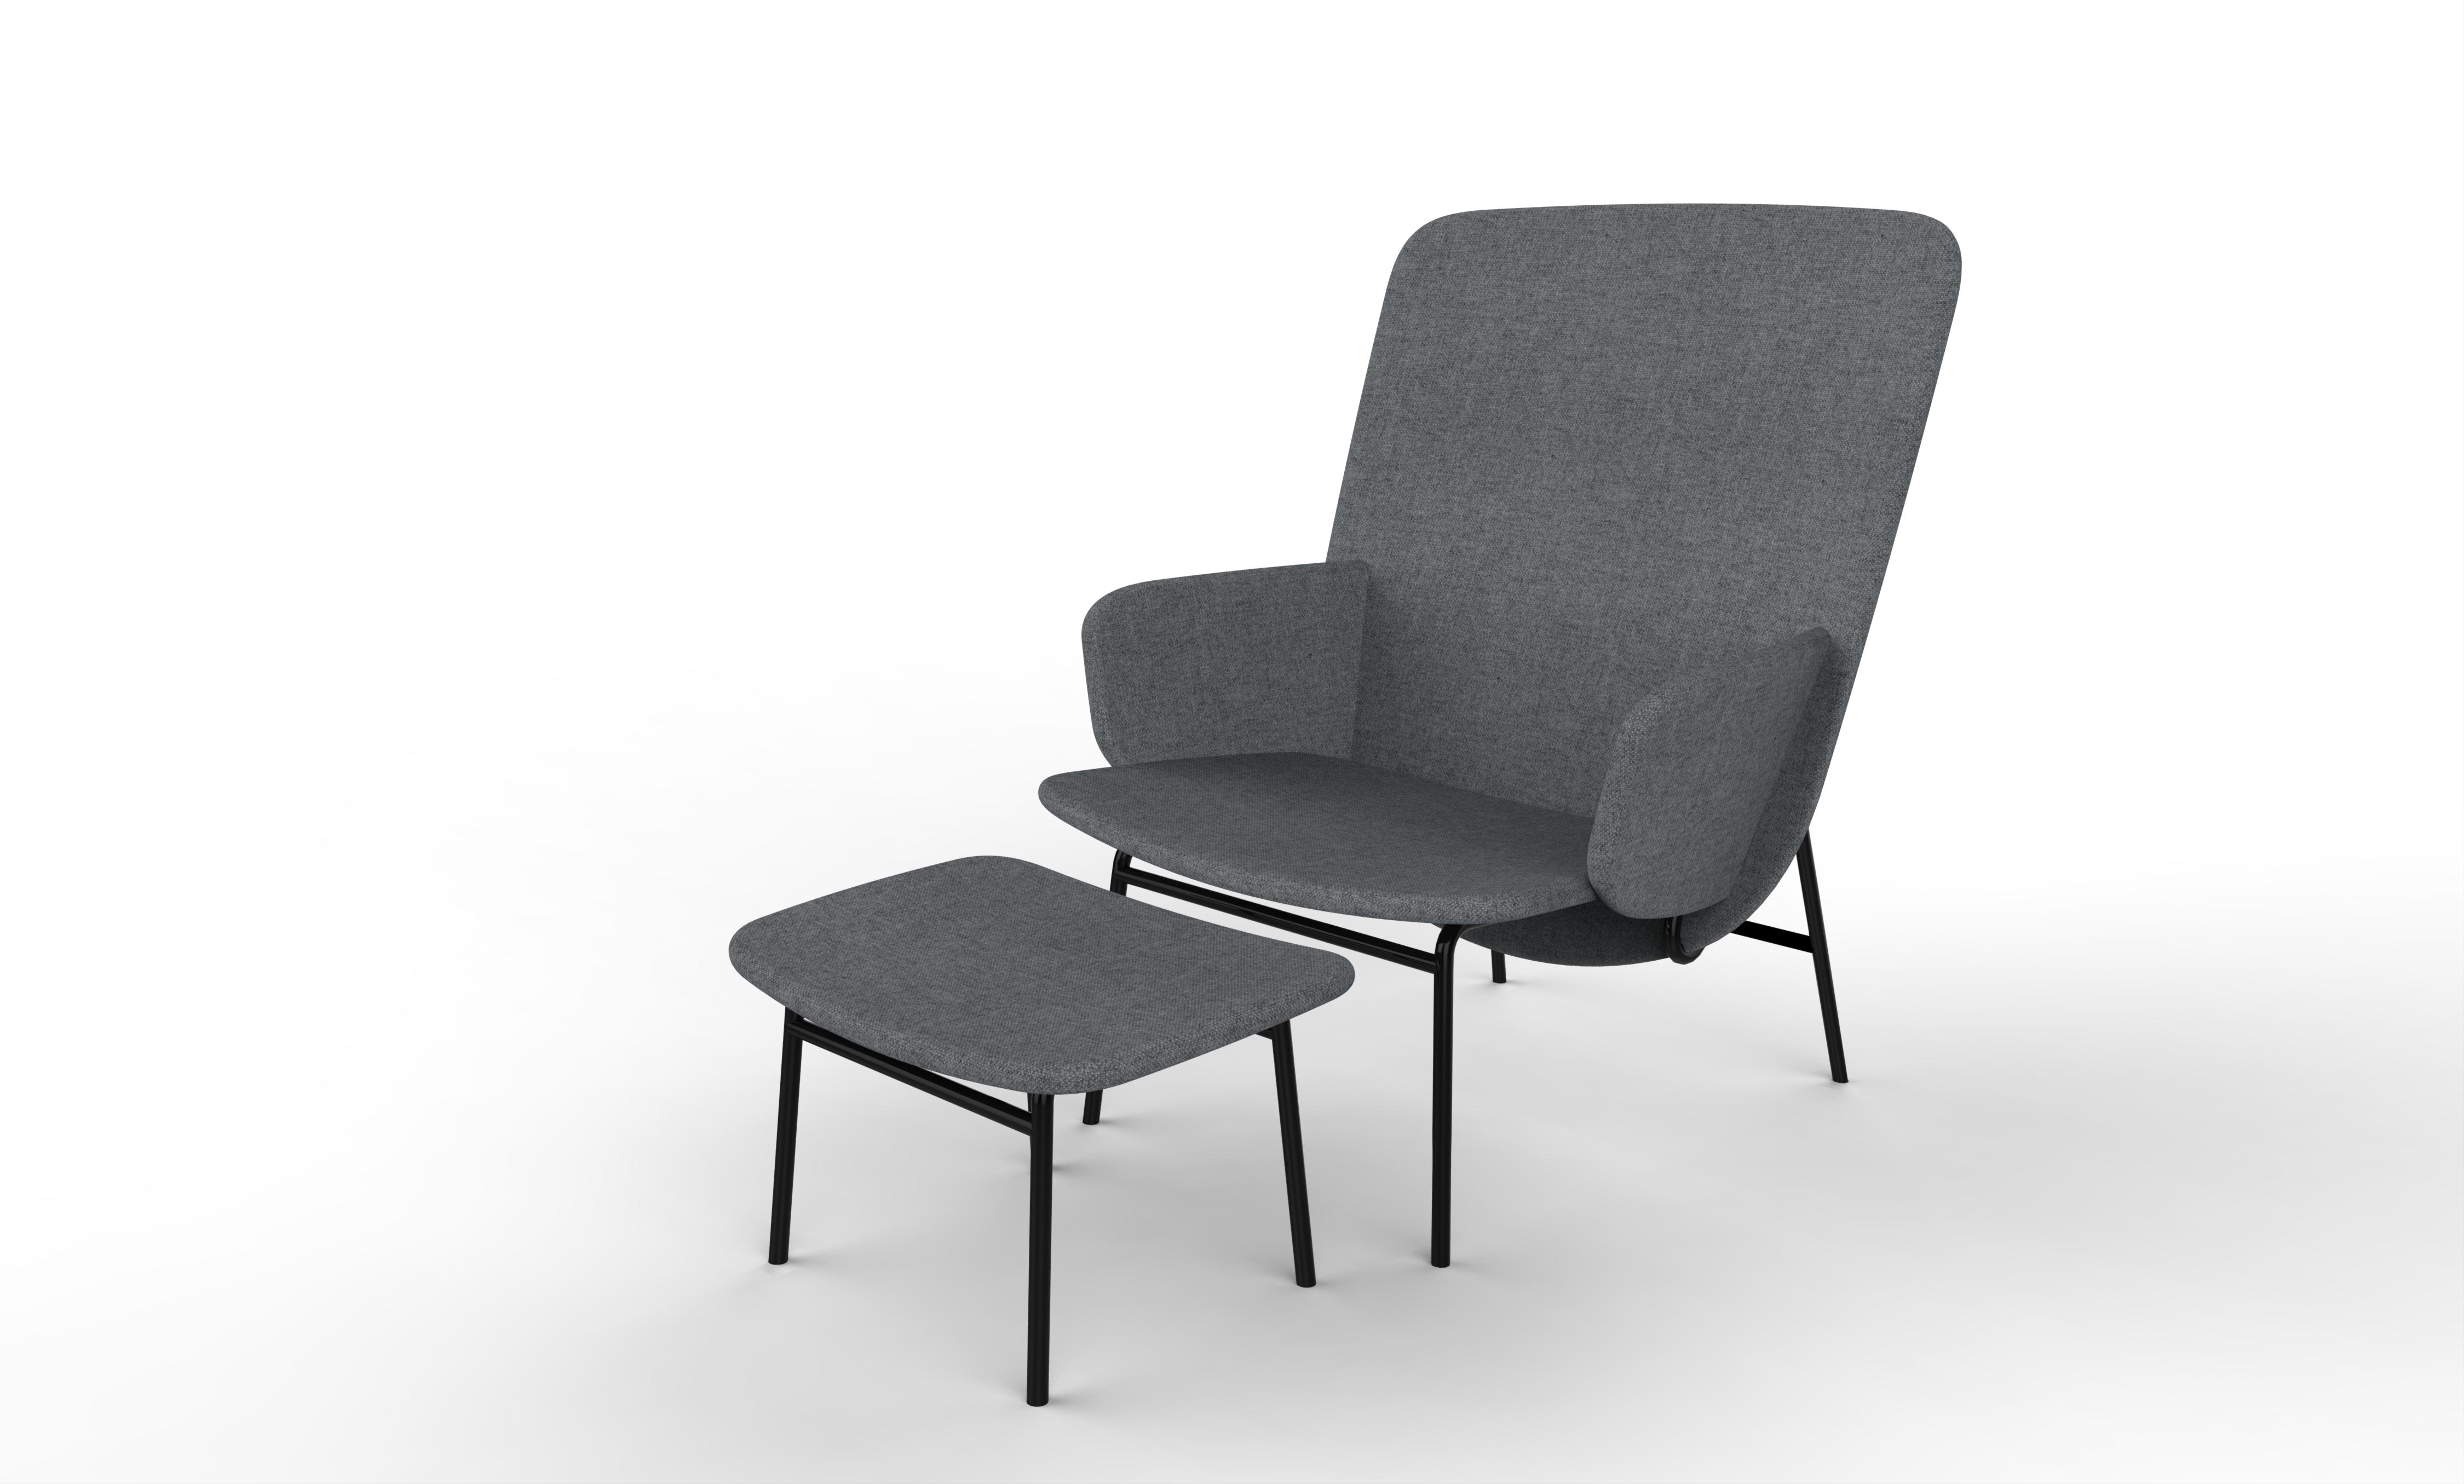 Ala Armchair & Footstool by Sebastian Herkner for La Cividina